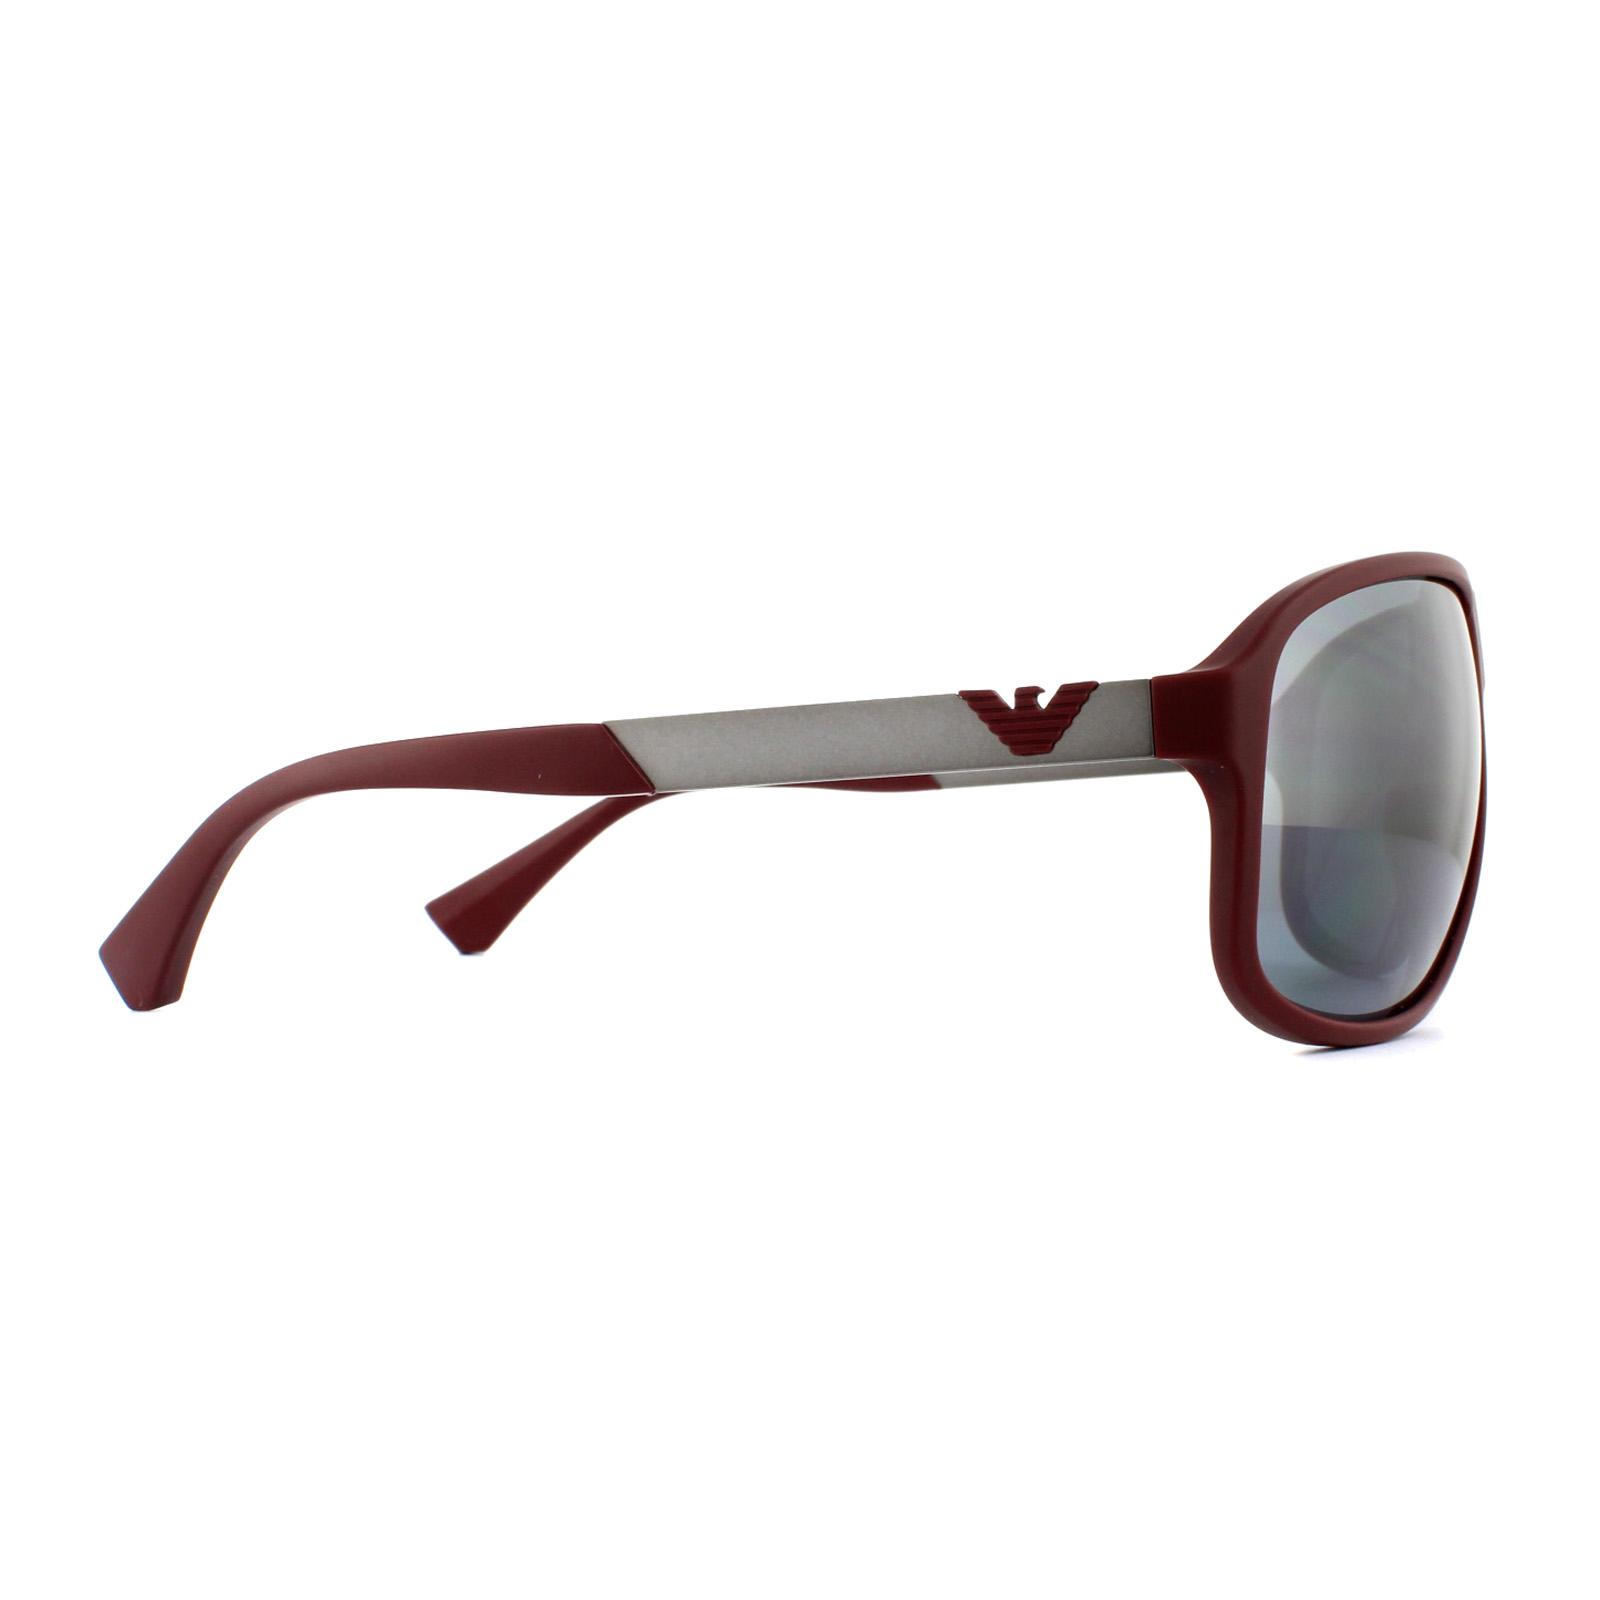 0ba89e5d19 CENTINELA Emporio Armani gafas de sol 4029 56066 Bordeaux goma luz gris  espejo